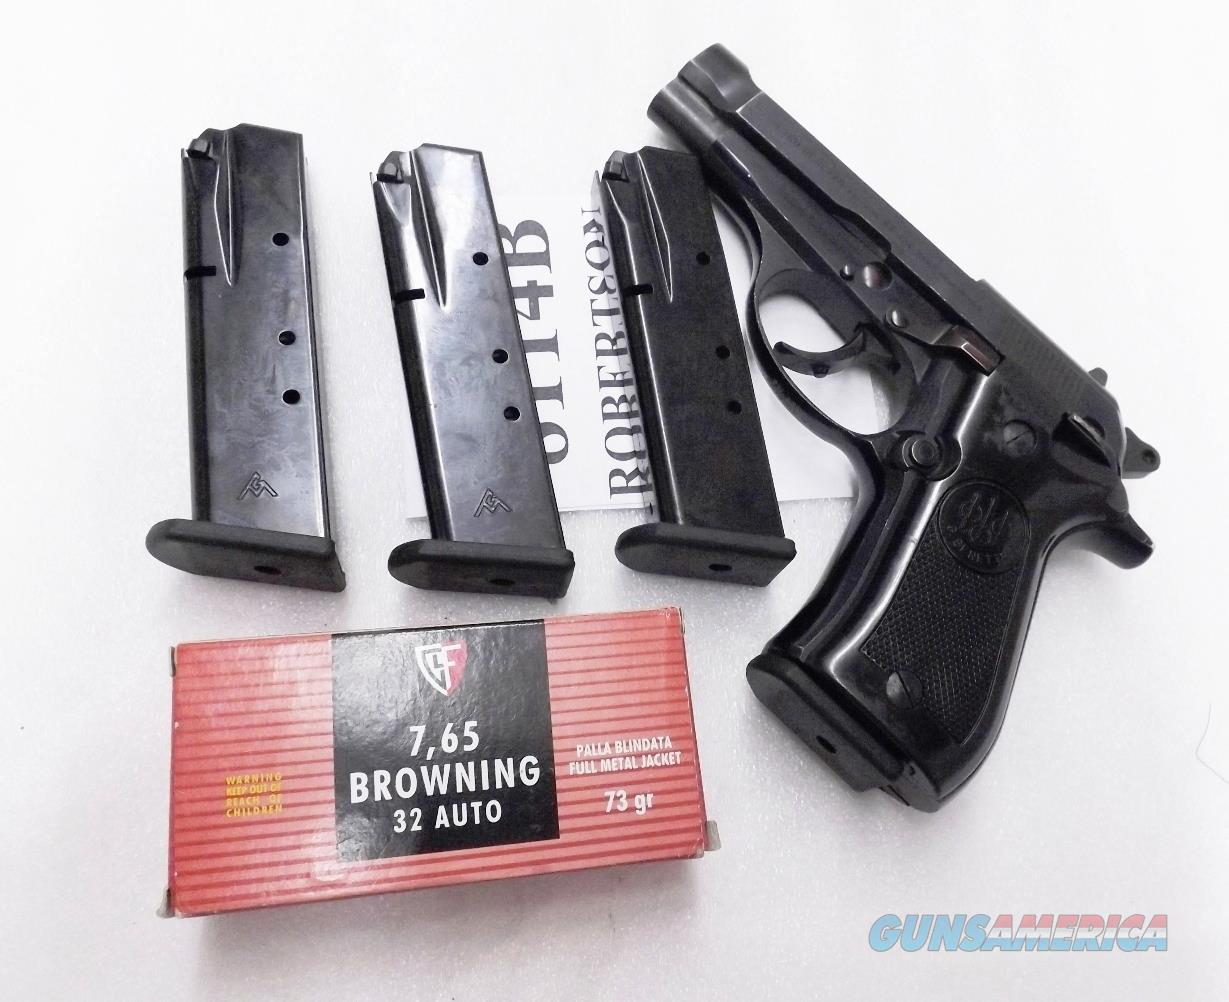 3 Beretta model 81 Cheetah .32 ACP Modified Mec-Gar 14 shot Magazines C85888 type $28 each Free Ship lower 48  Non-Guns > Magazines & Clips > Pistol Magazines > Beretta